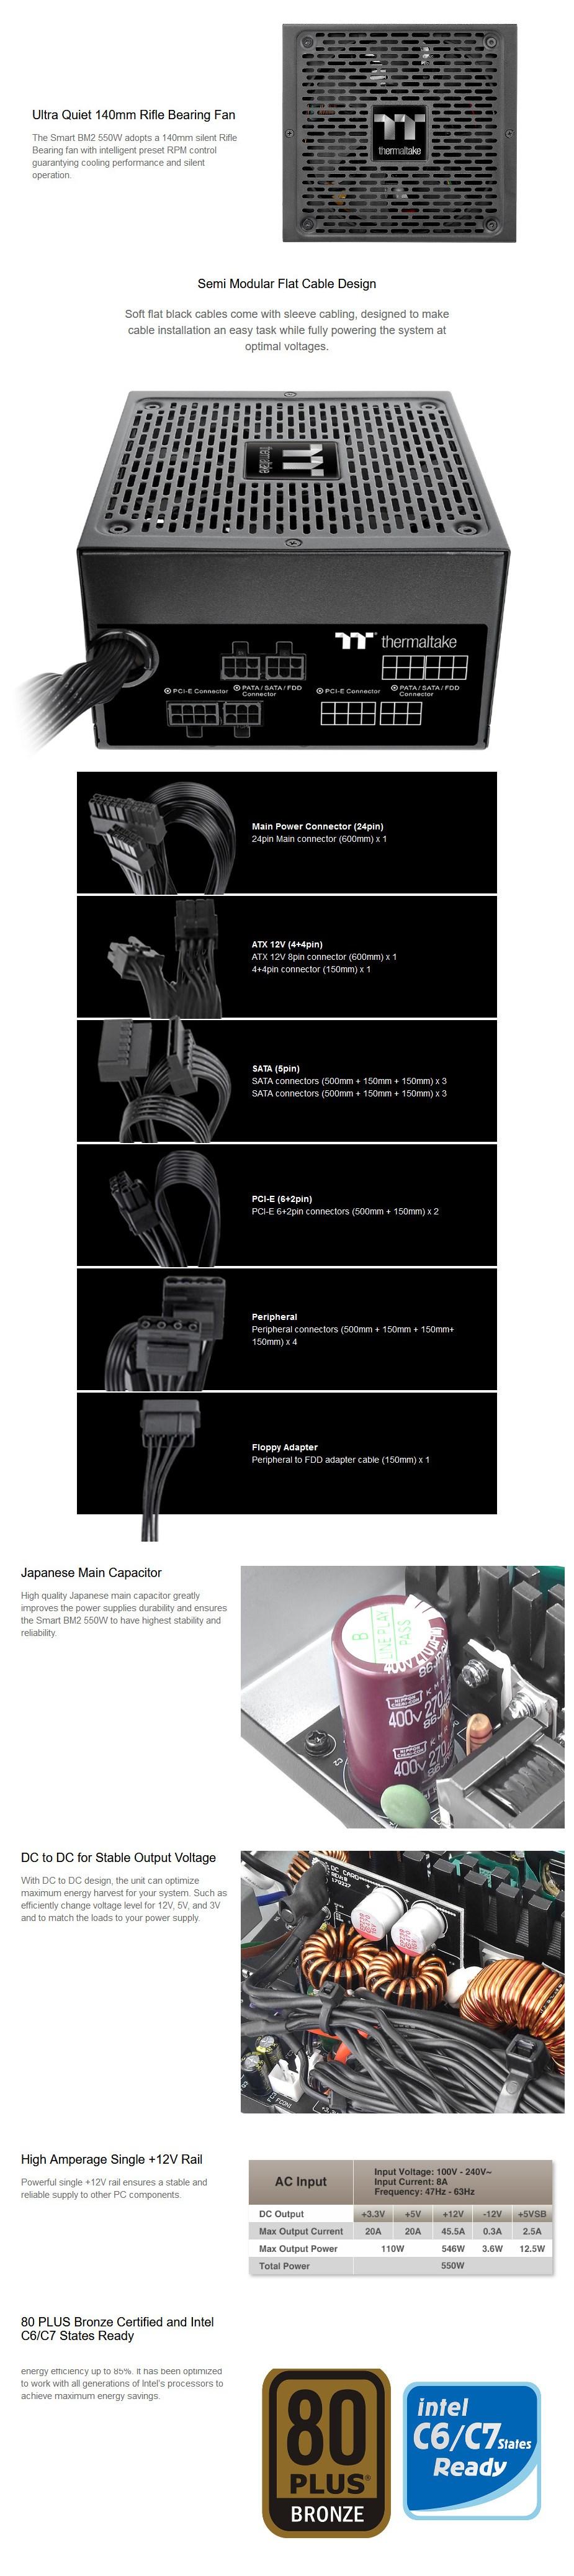 Thermaltake Smart BM2 Series 550W 80+ Bronze Semi-Modular Power Supply - Overview 1